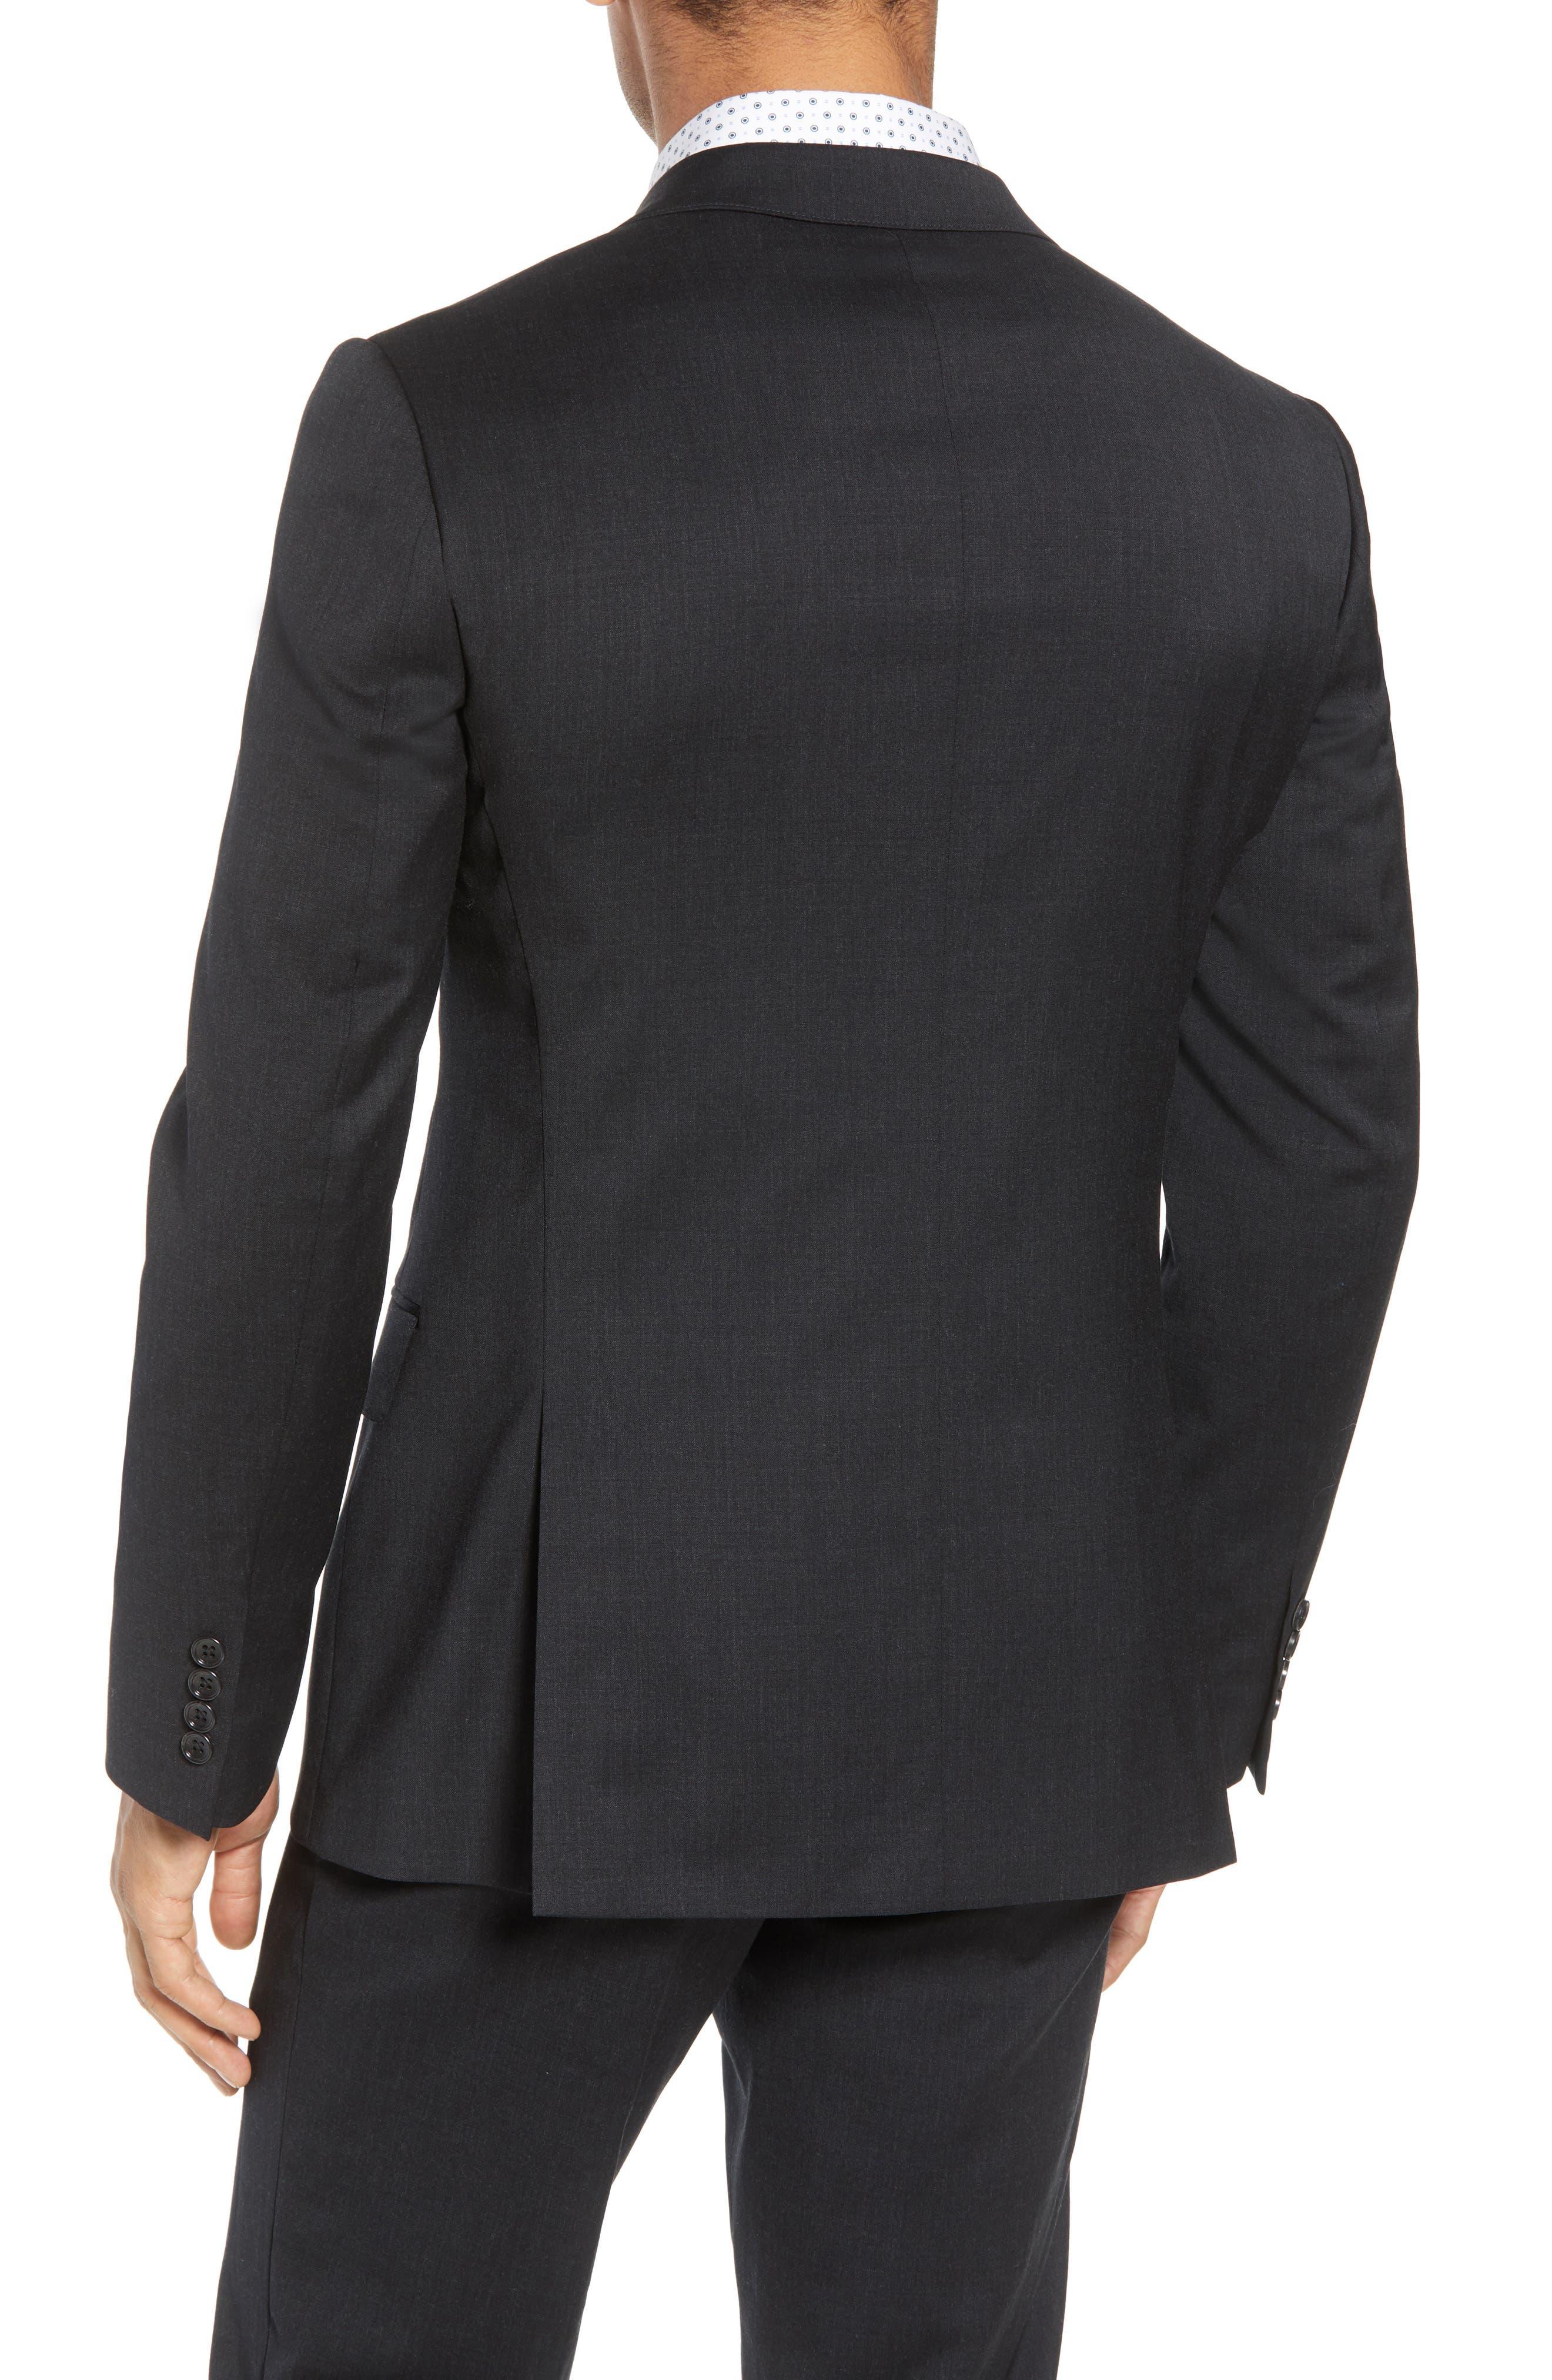 BONOBOS, Jetsetter Slim Fit Stretch Wool Blazer, Alternate thumbnail 2, color, CHARCOAL